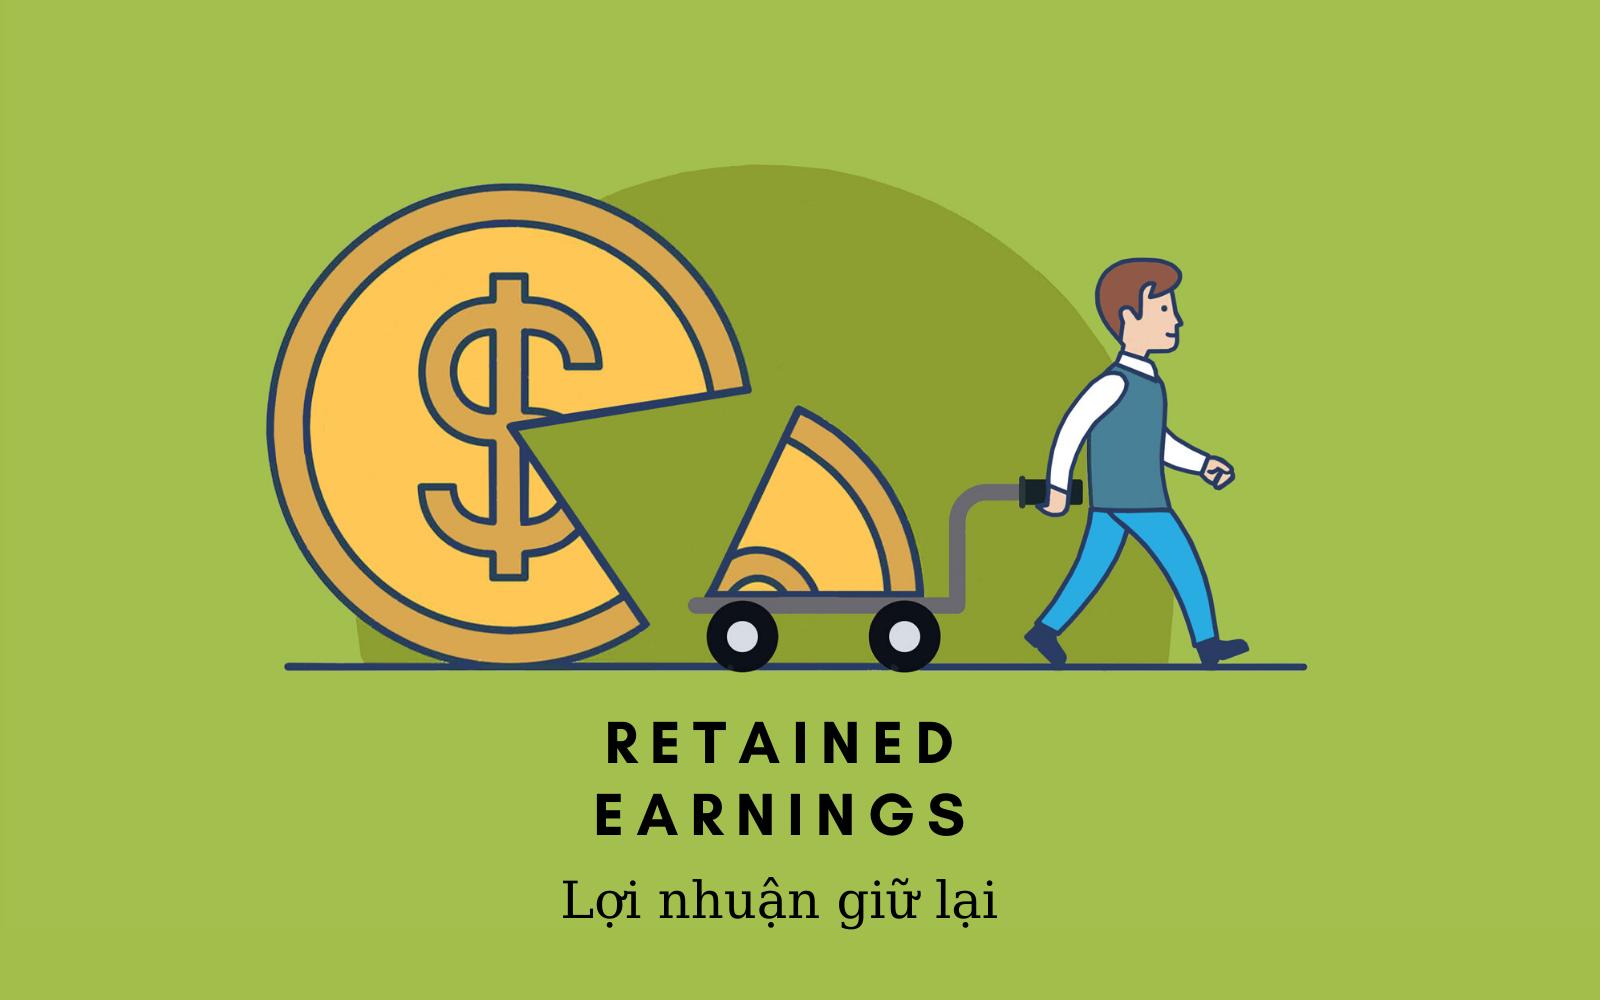 Lợi nhuận giữ lại (Retained Earnings) là gì? Sử dụng lợi nhuận giữ lại như  thế nào?